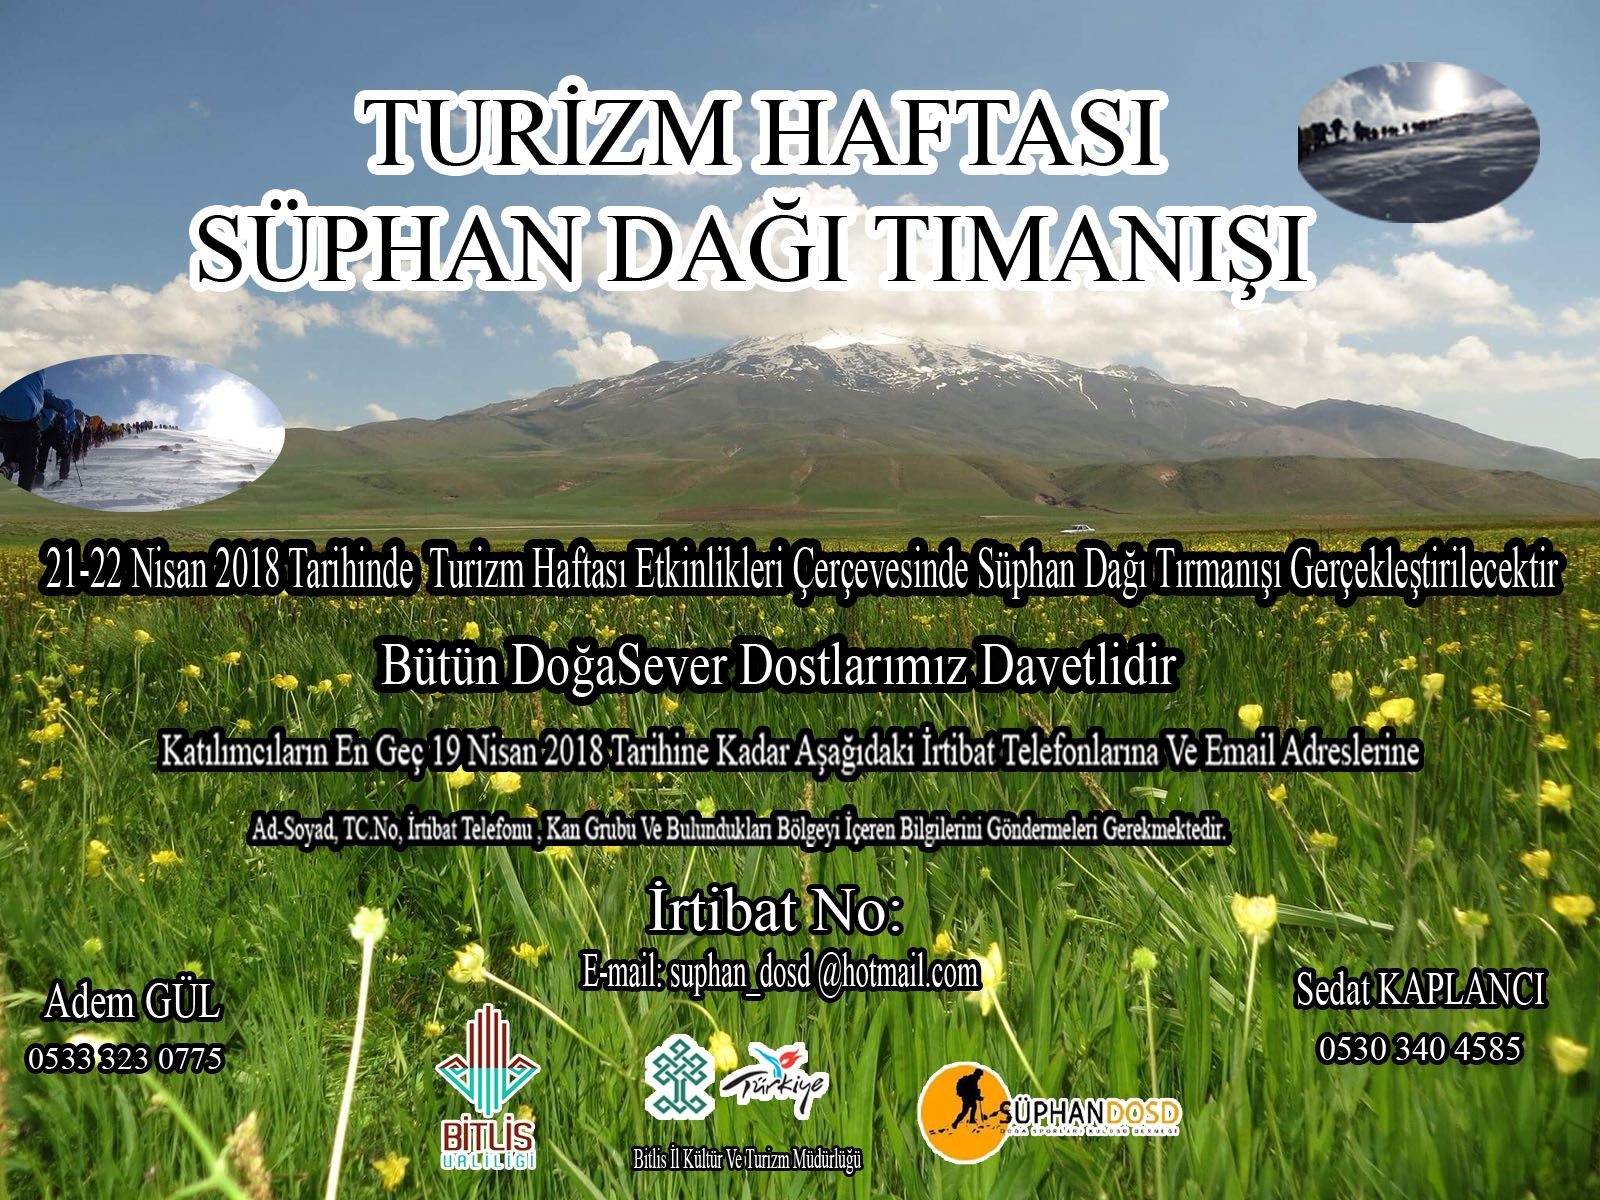 Turizm Haftası Süphan Dağı Tırmanışı Daveti